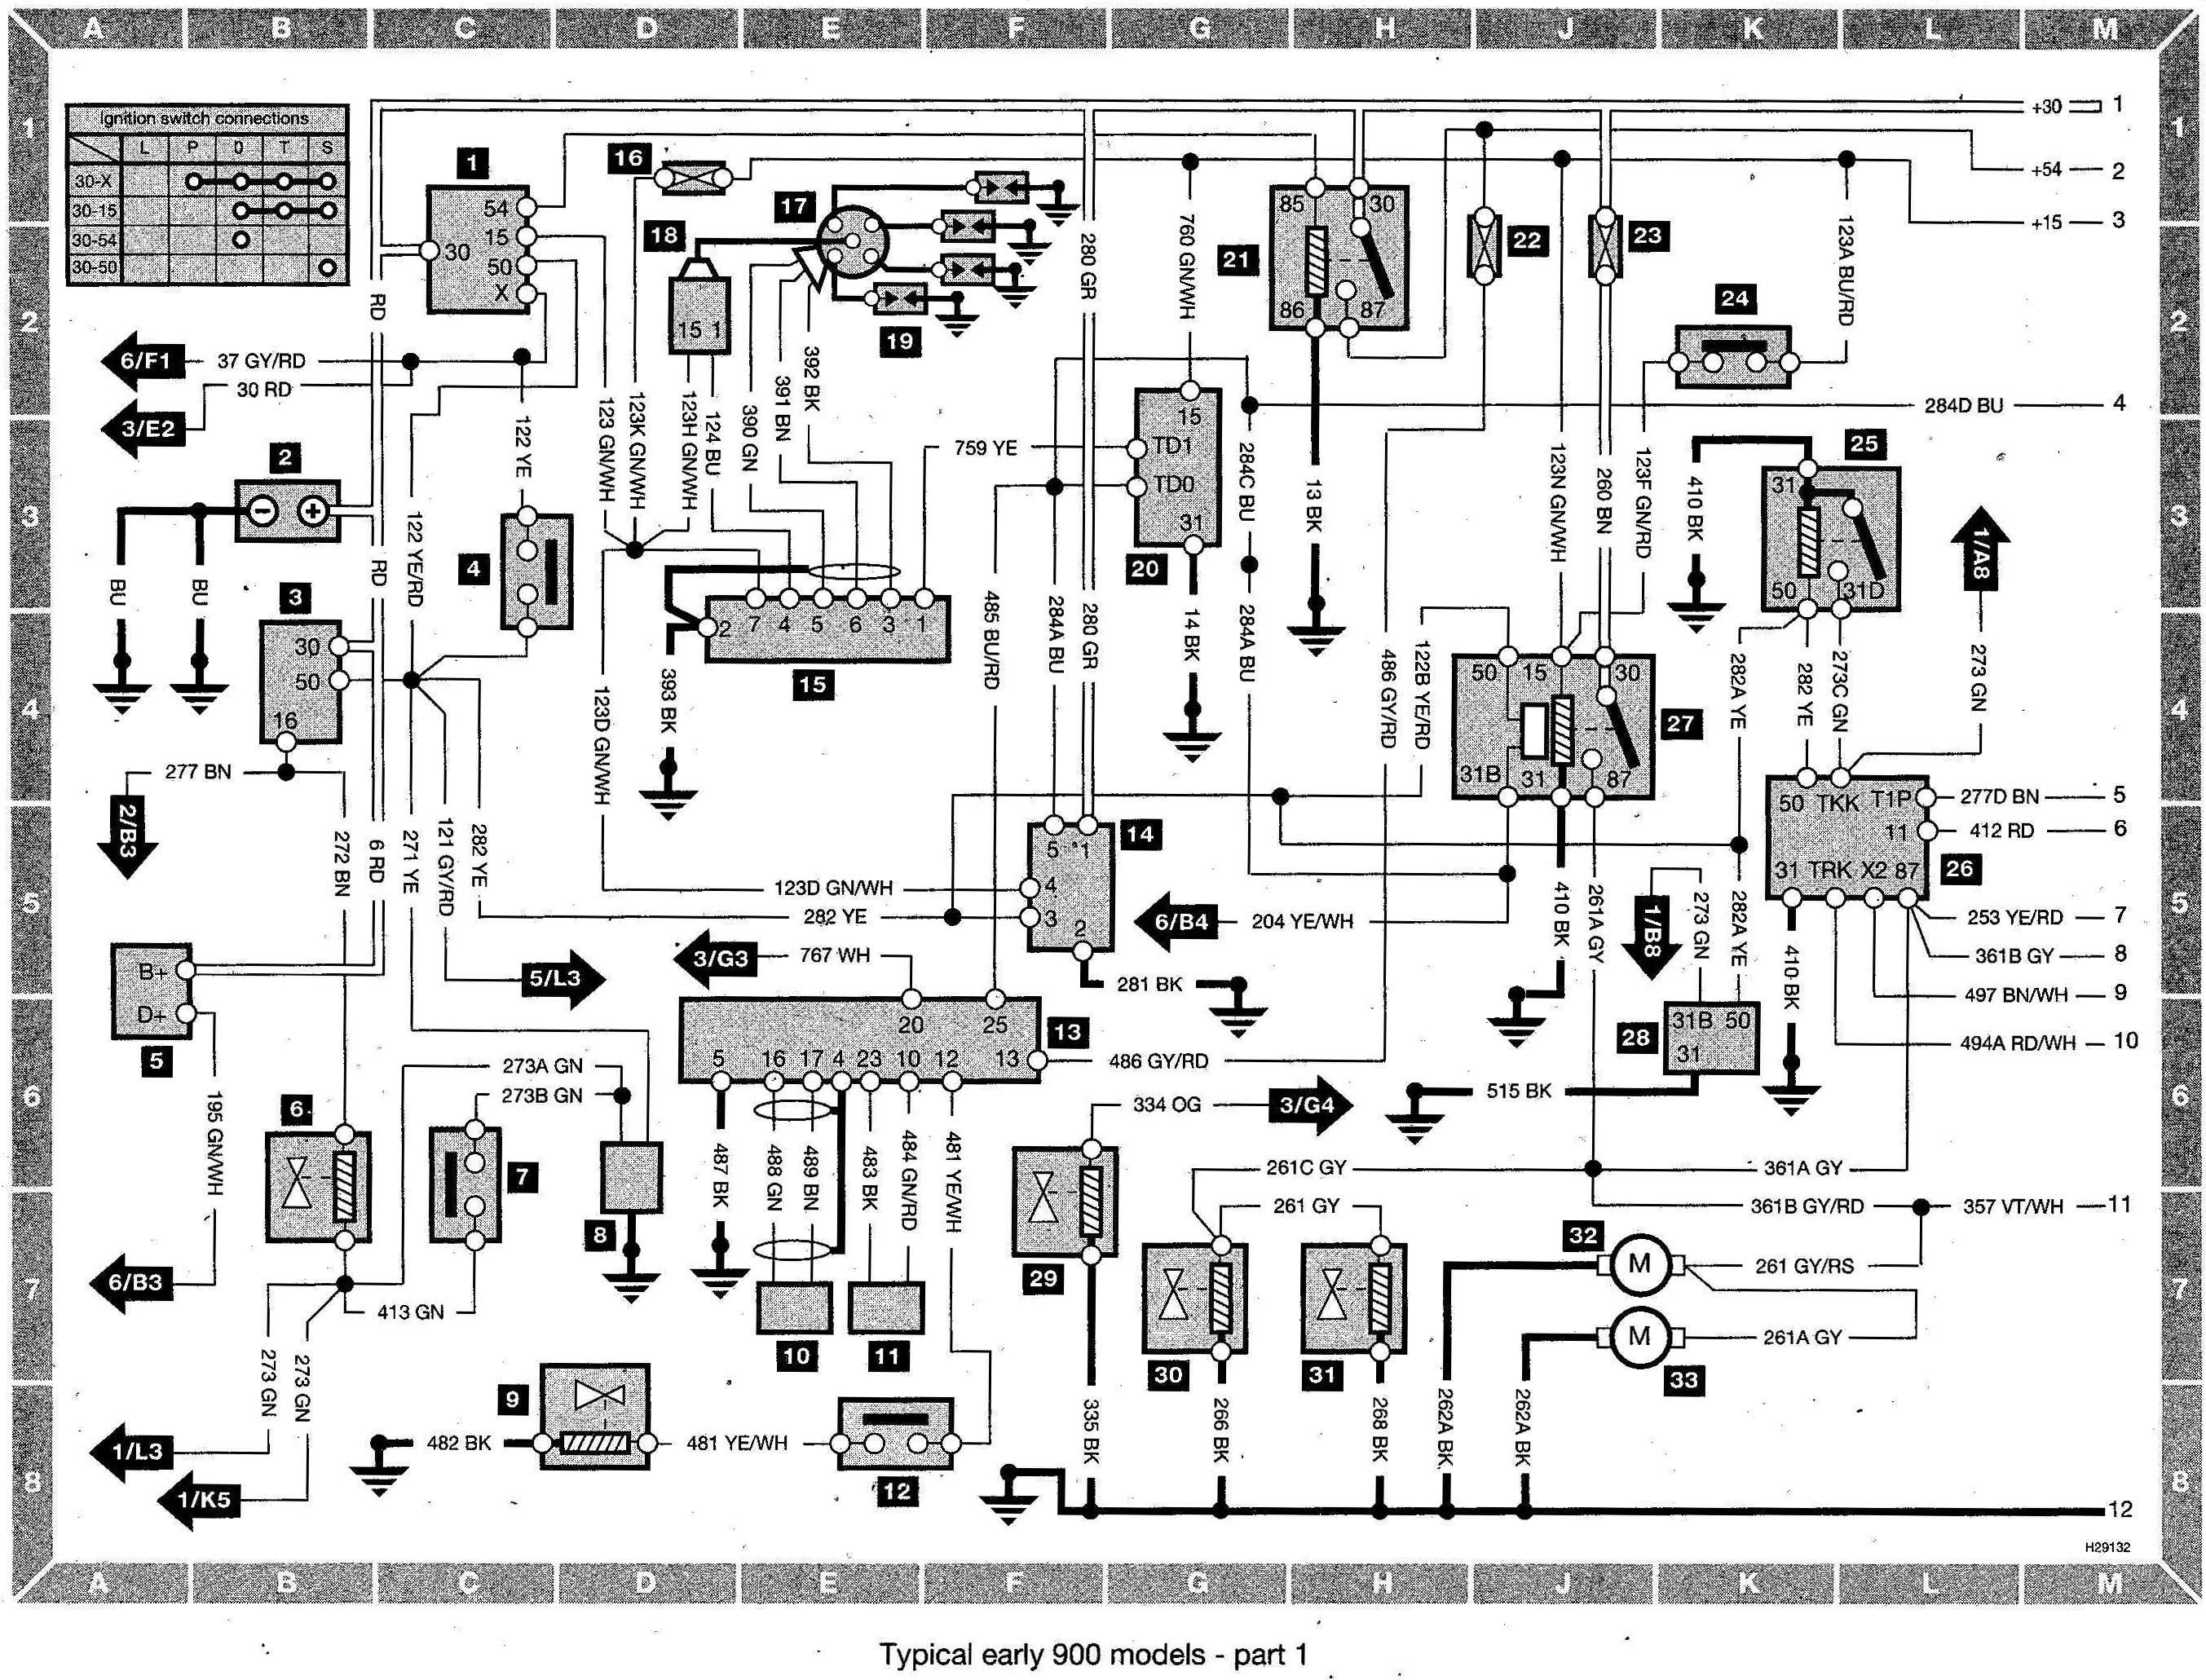 Saab 900 Wiring Diagram Pdf